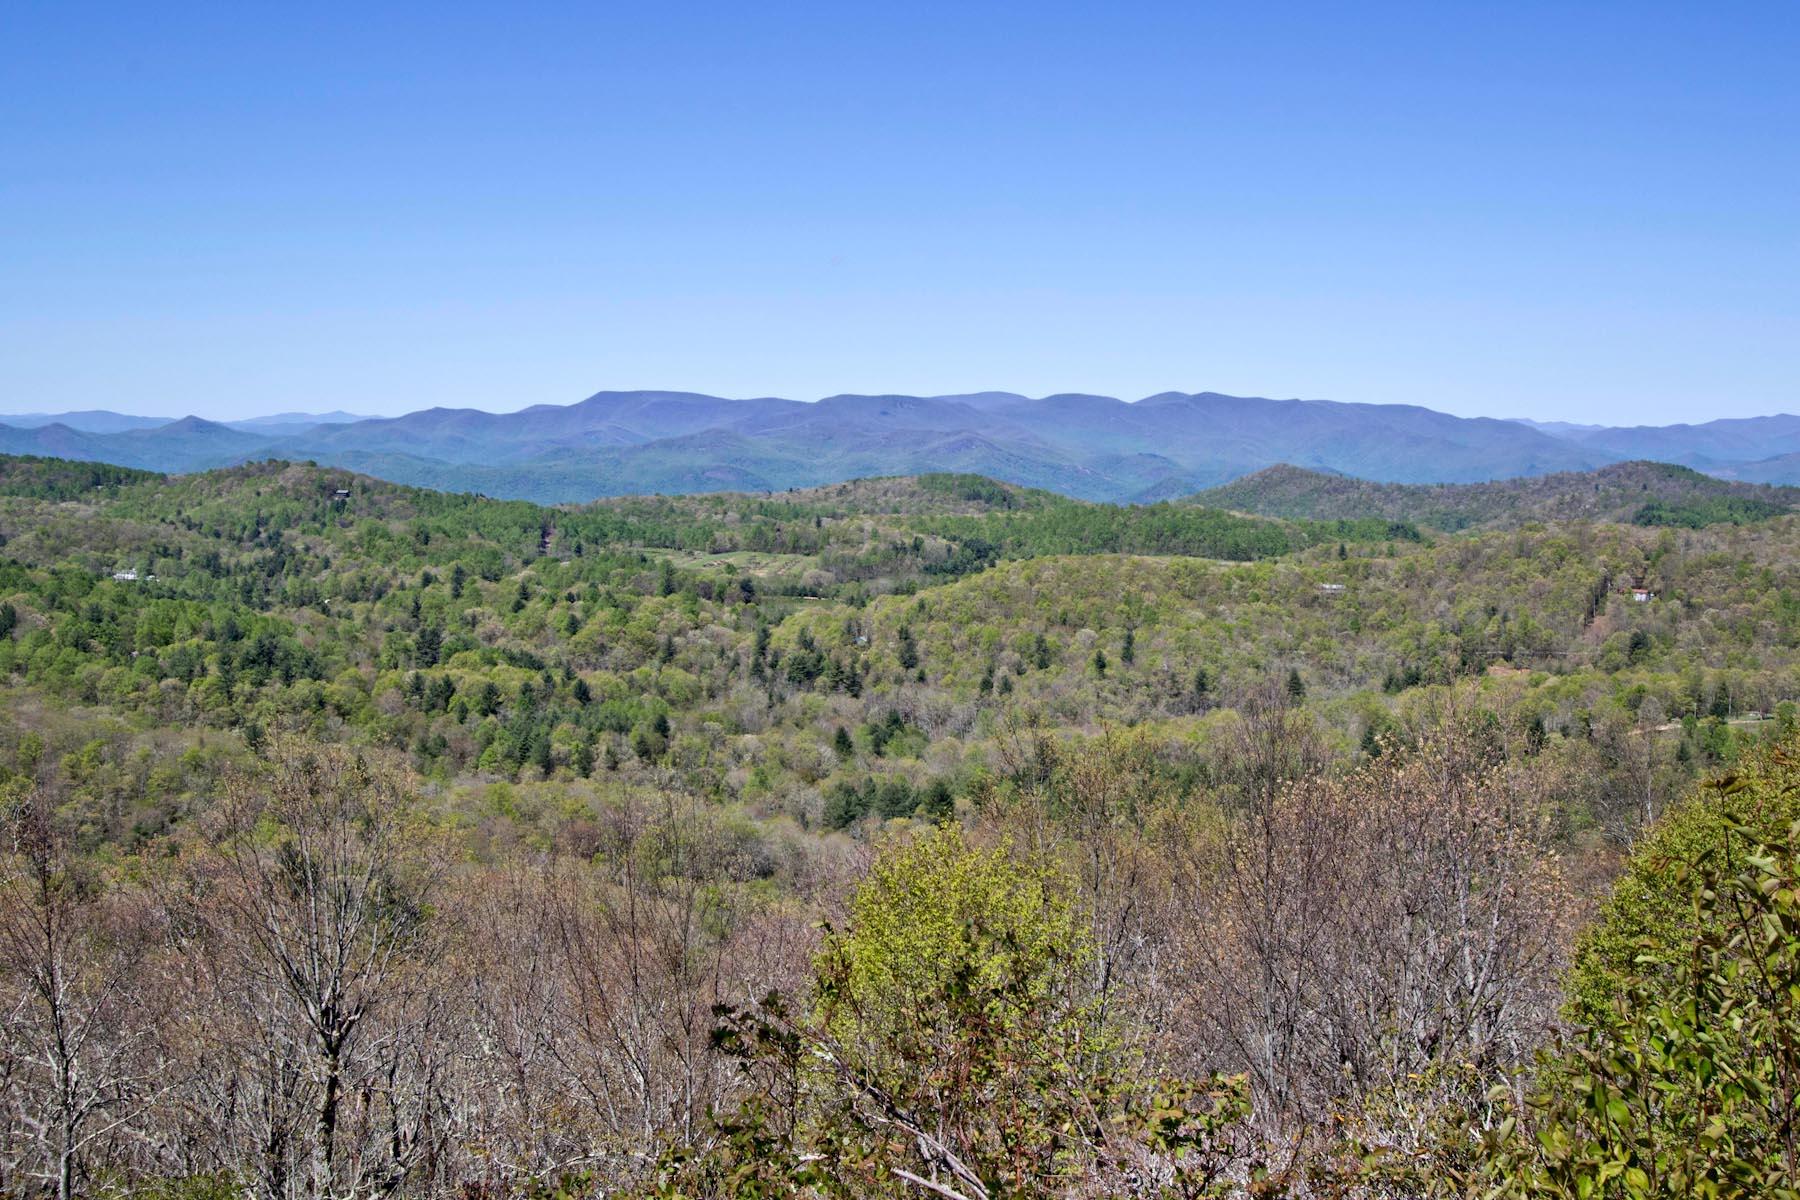 Single Family Home for Sale at 88 King Circle Highlands, North Carolina, 28741 United States